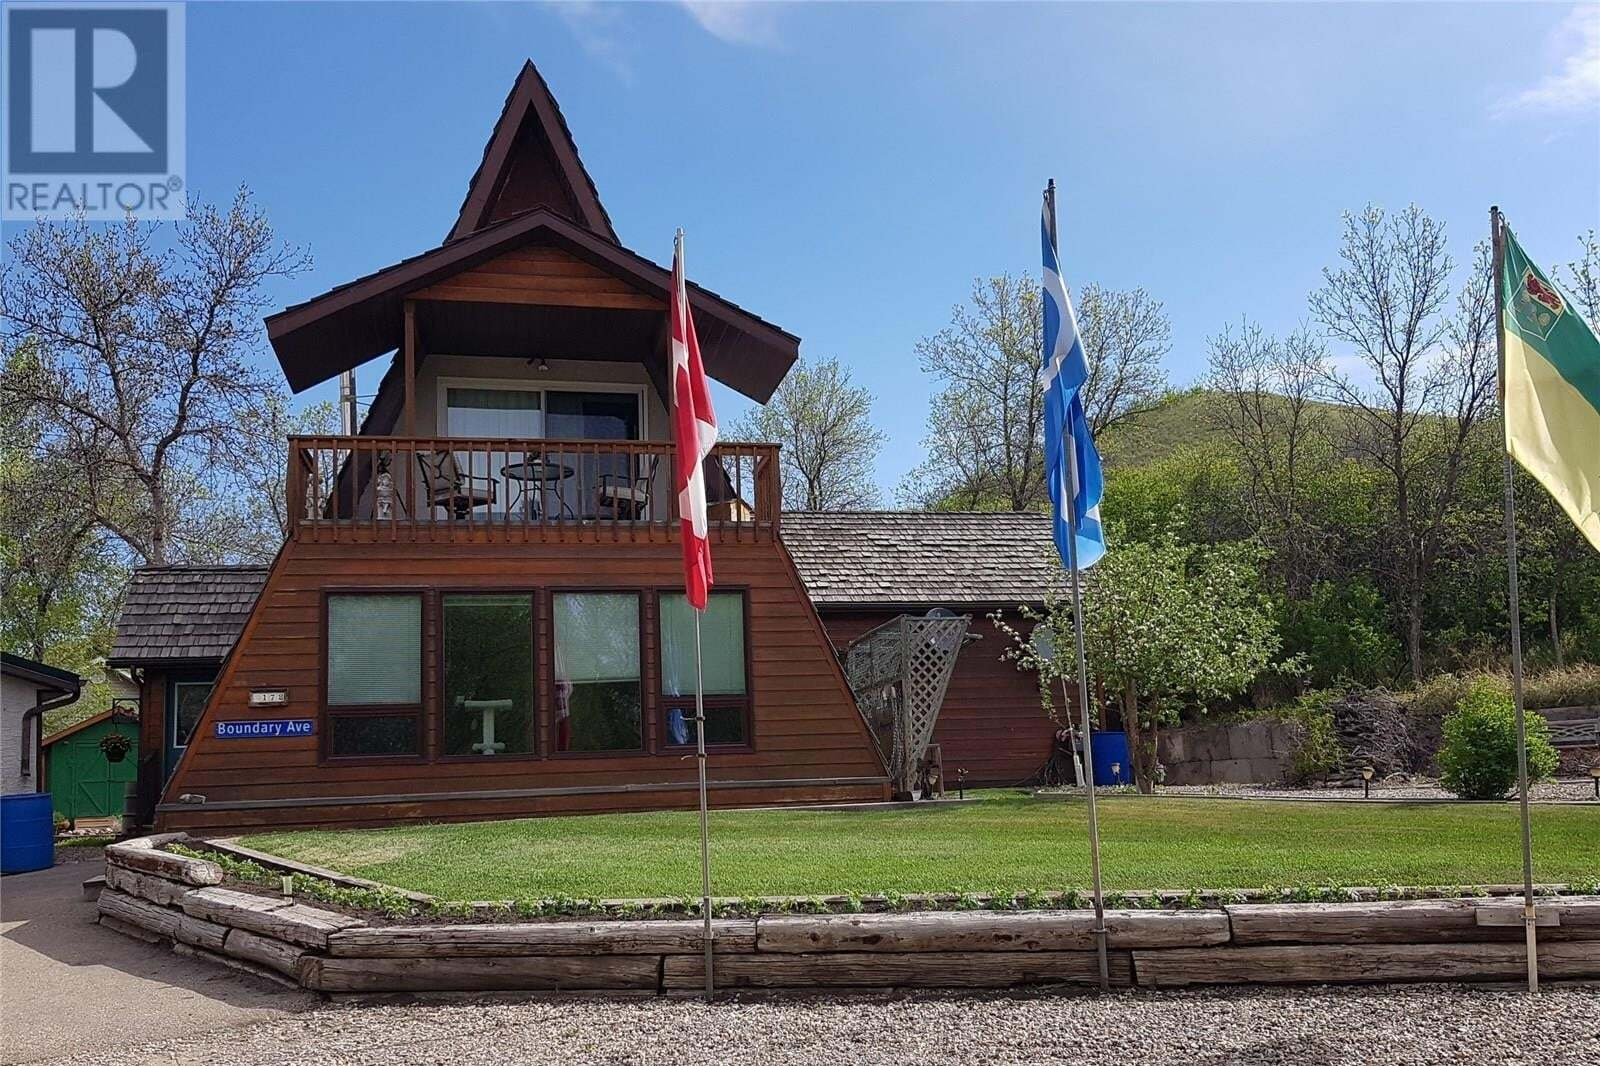 House for sale at 172 Boundary Ave Katepwa Beach Saskatchewan - MLS: SK809929